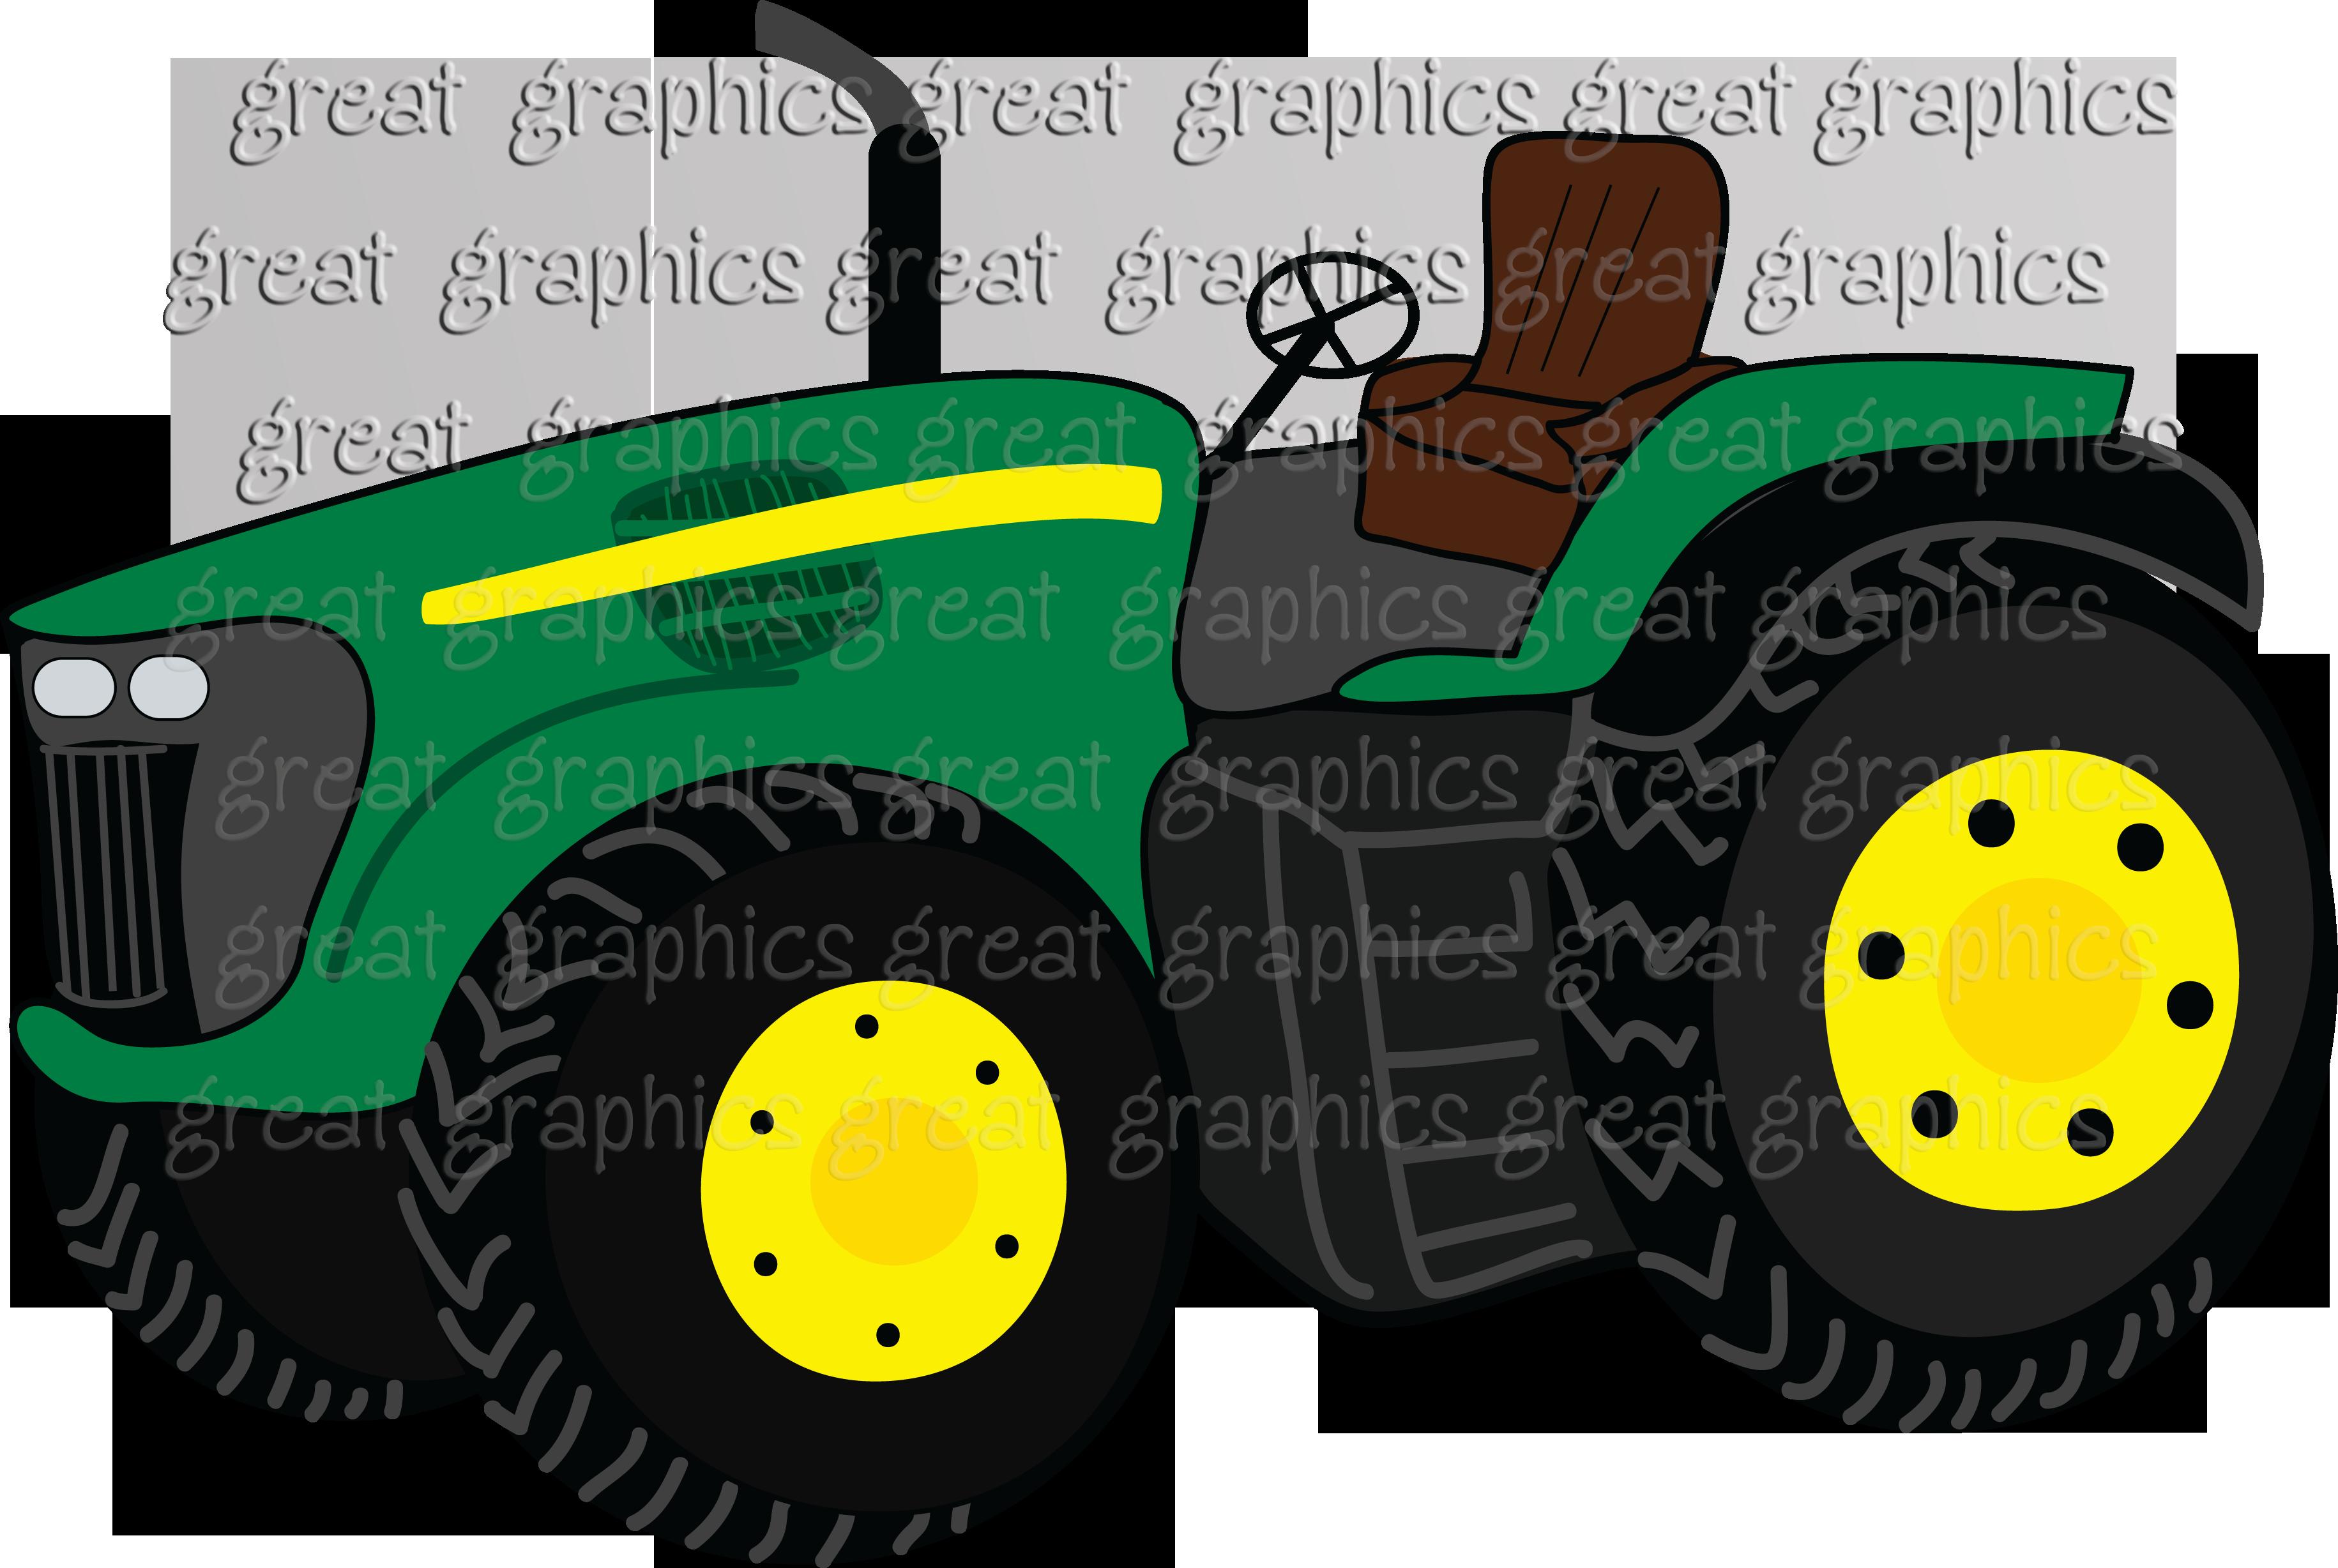 John Deere Tractor Cartoon Drawing : Cartoon john deere tractor google search branding farm